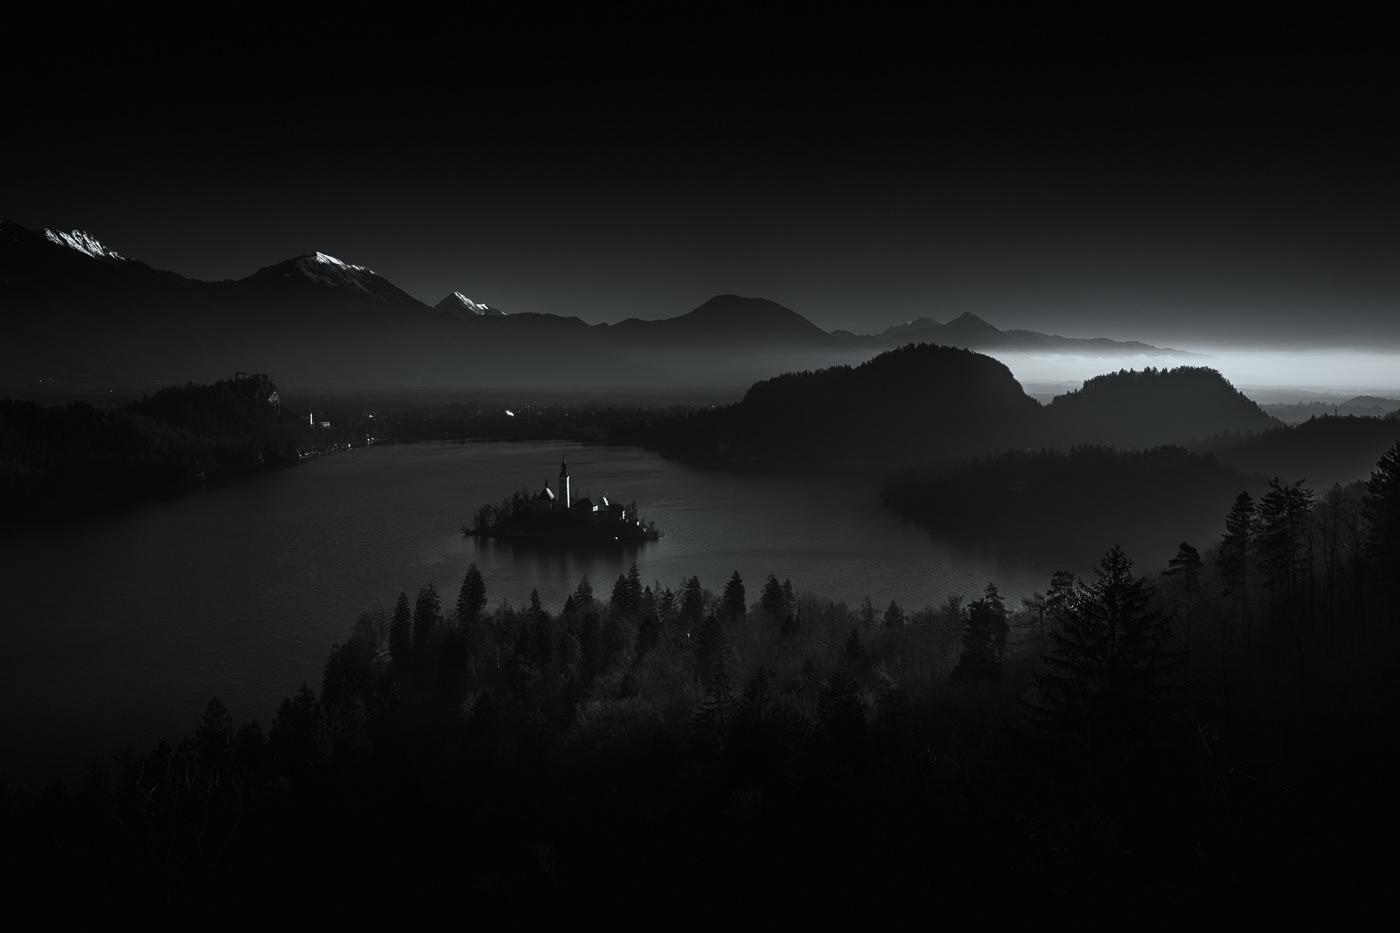 Landscape Minimalism art abstract mood Hasselblad Photography  b&w blackandwhite Nature